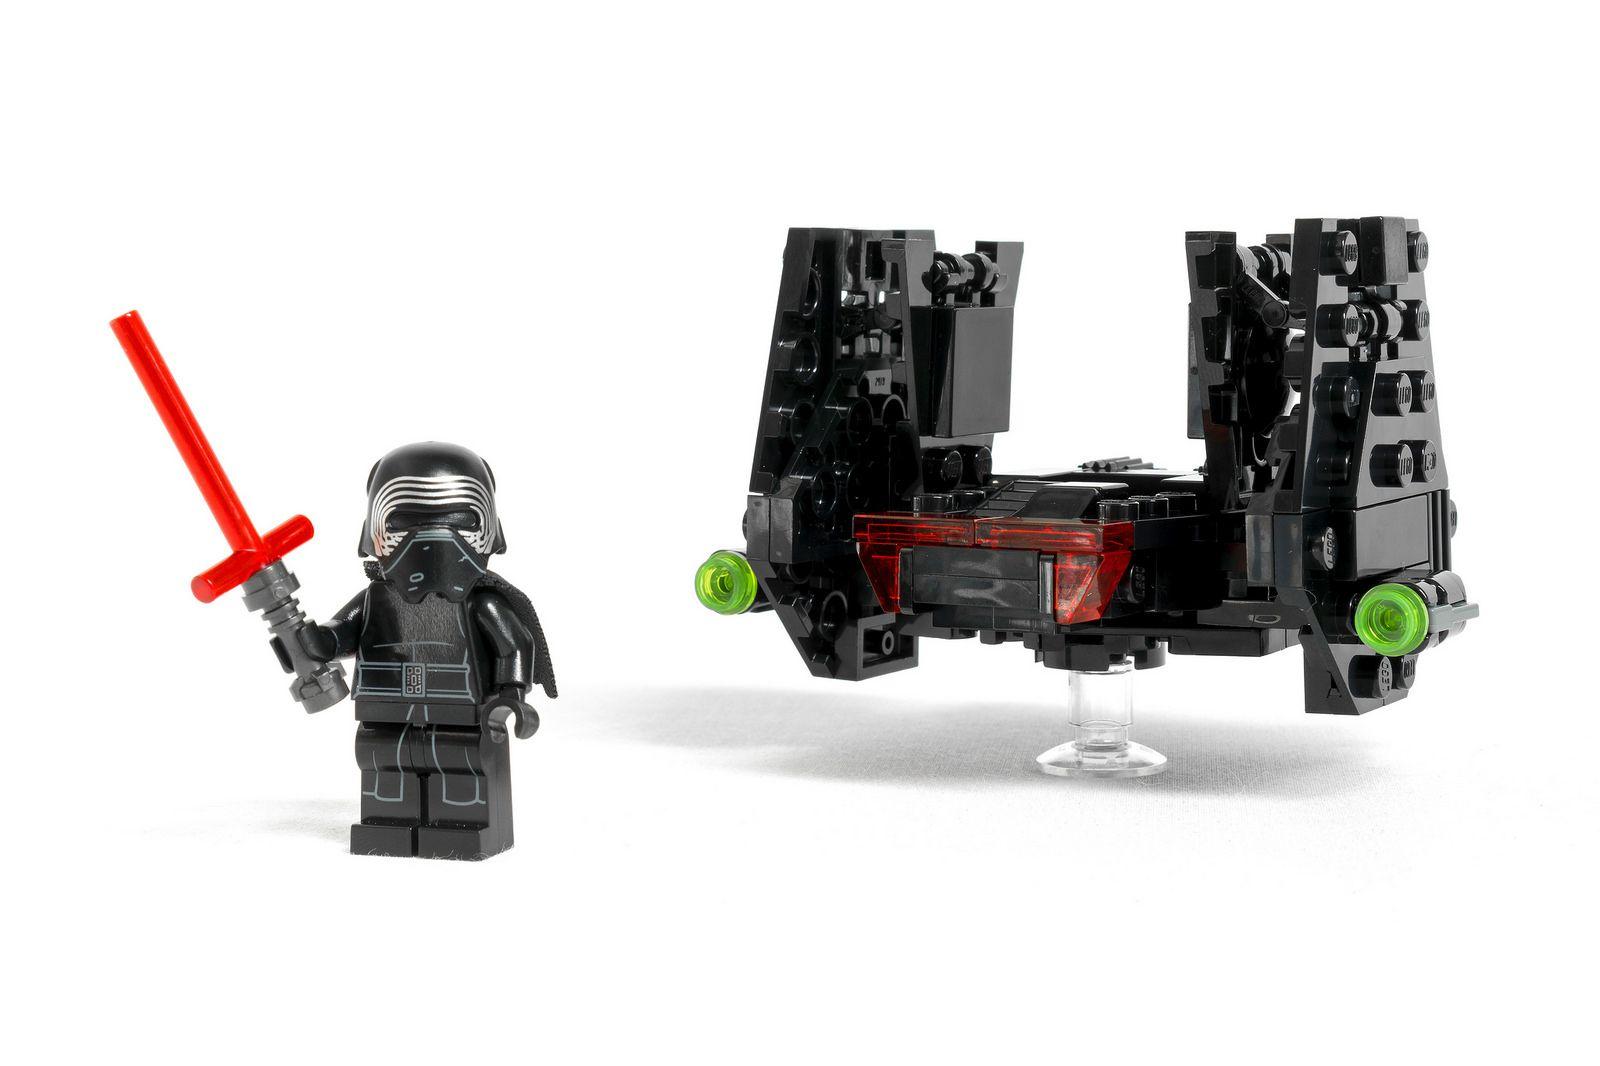 Lego Kylo Ren S Shuttle Micro Fighter Lego Kylo Ren Lego Kylo Ren Shuttle Kylo Ren Shuttle